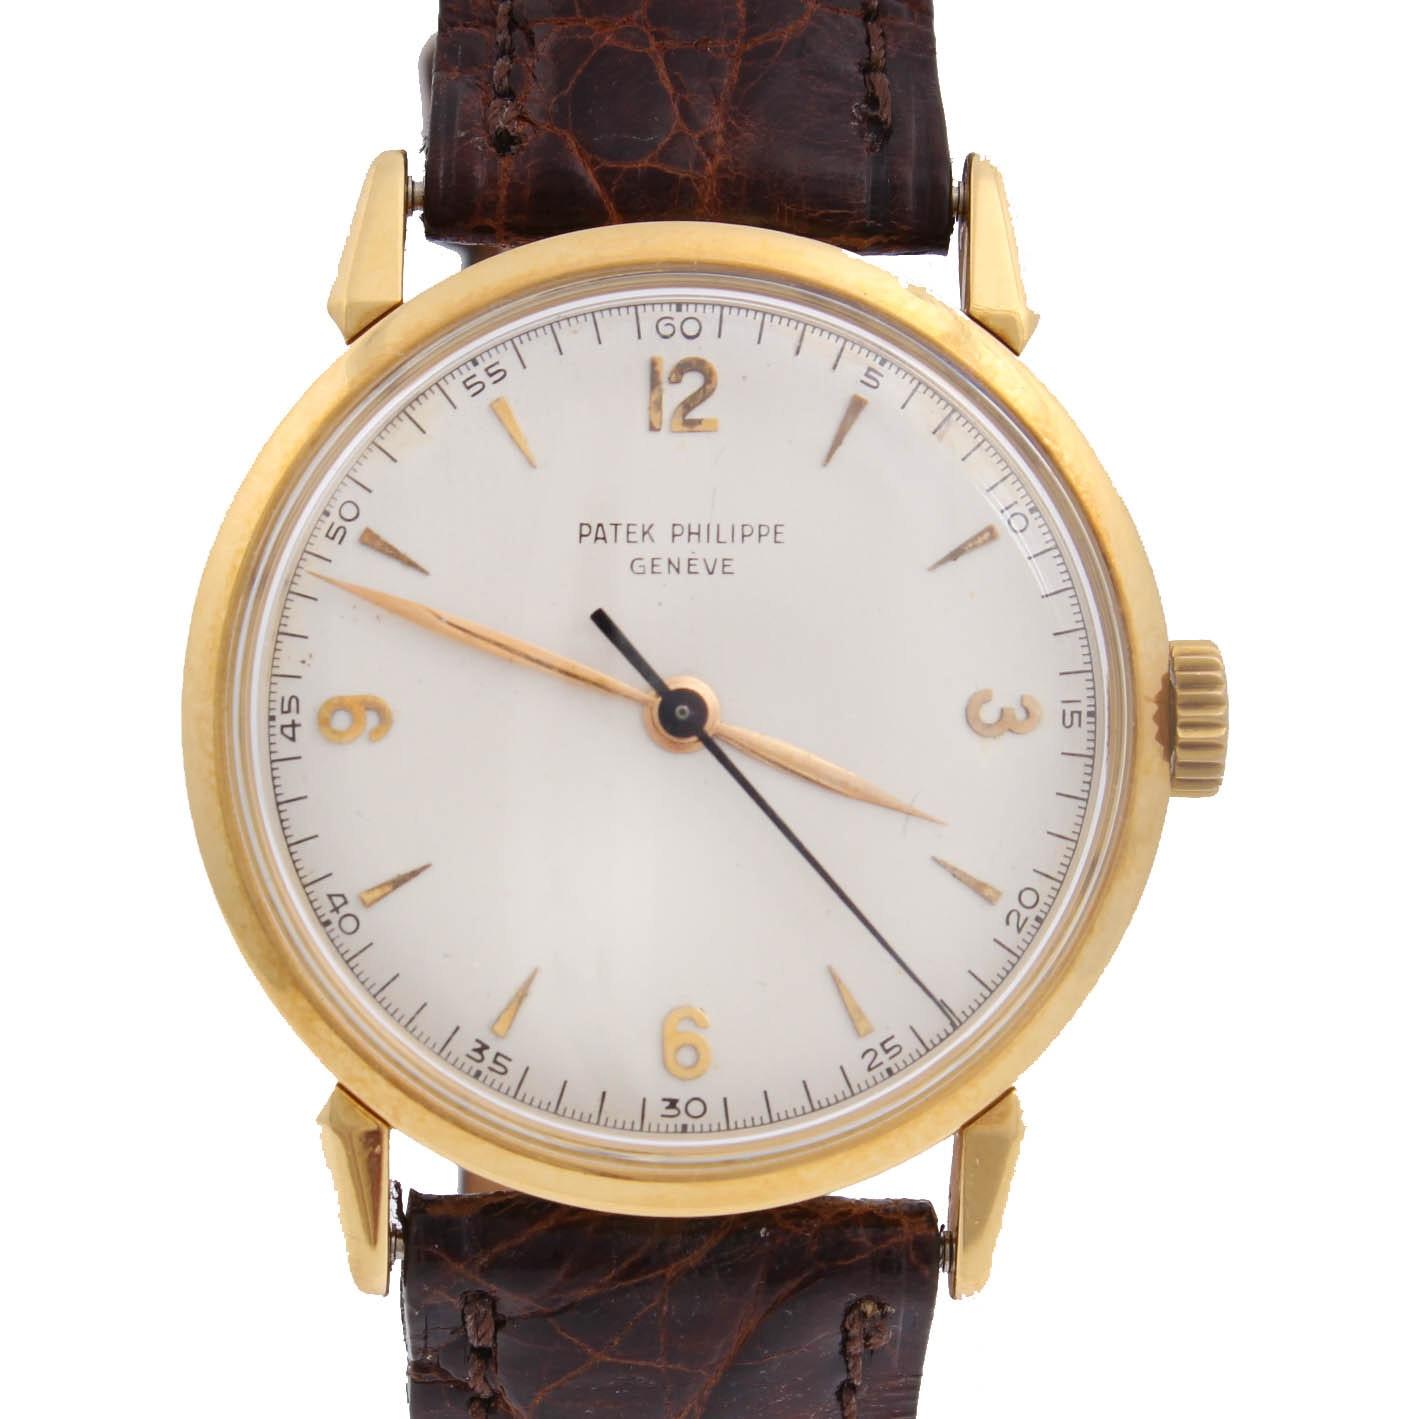 Vintage Patek Philippe 18K Yellow Gold Mechanical Wristwatch